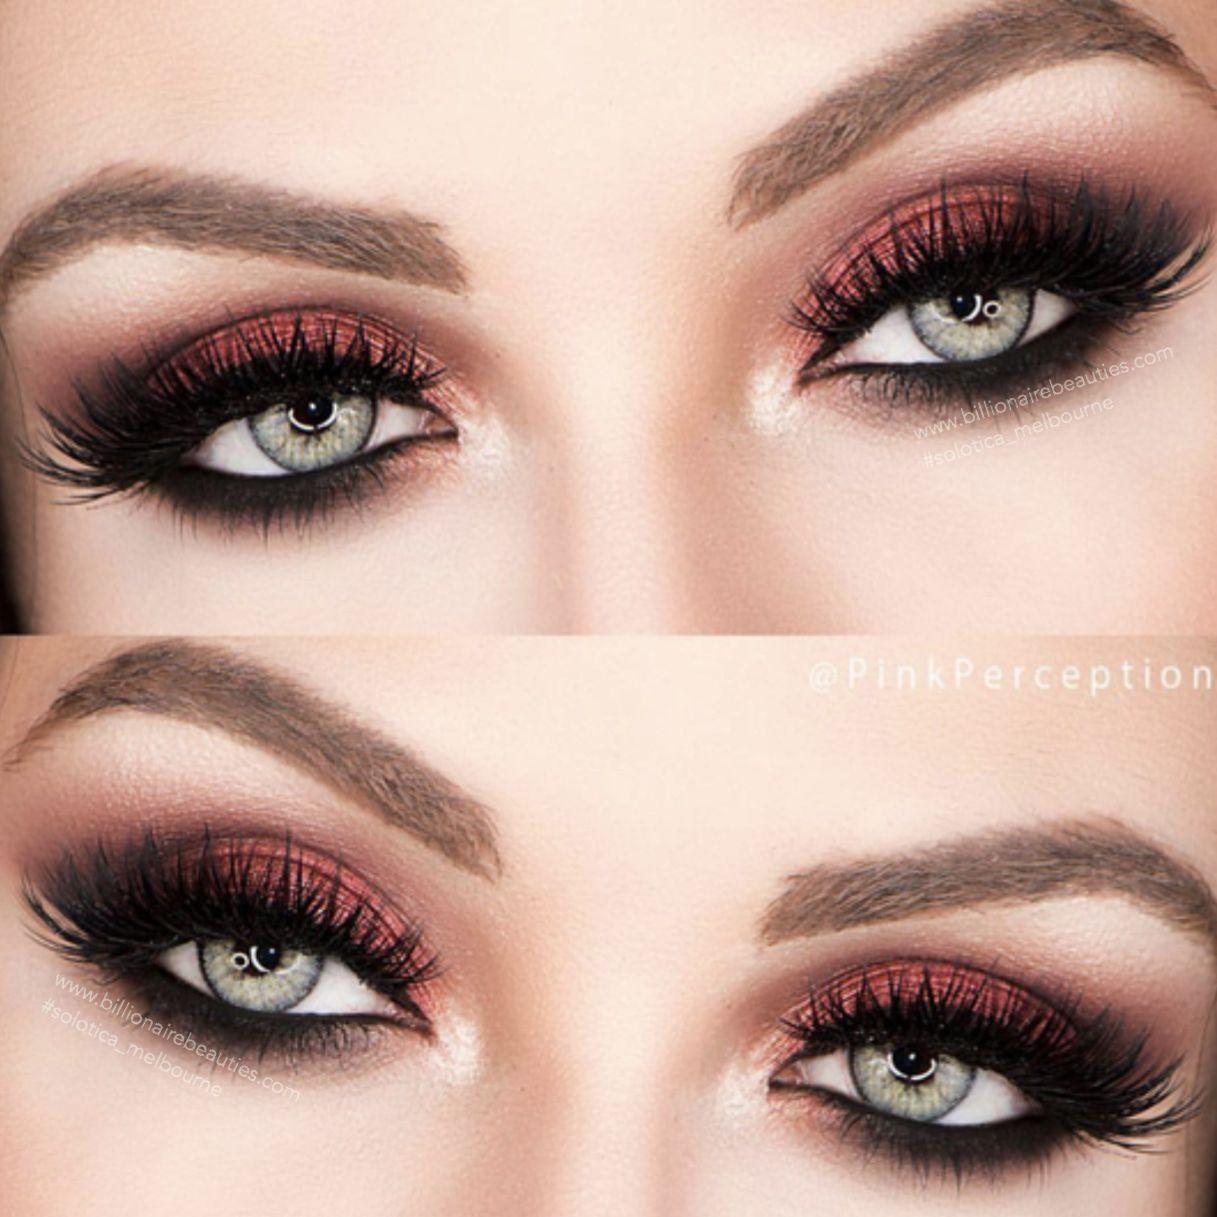 Amazing makeup artists pinkperception wearing natural